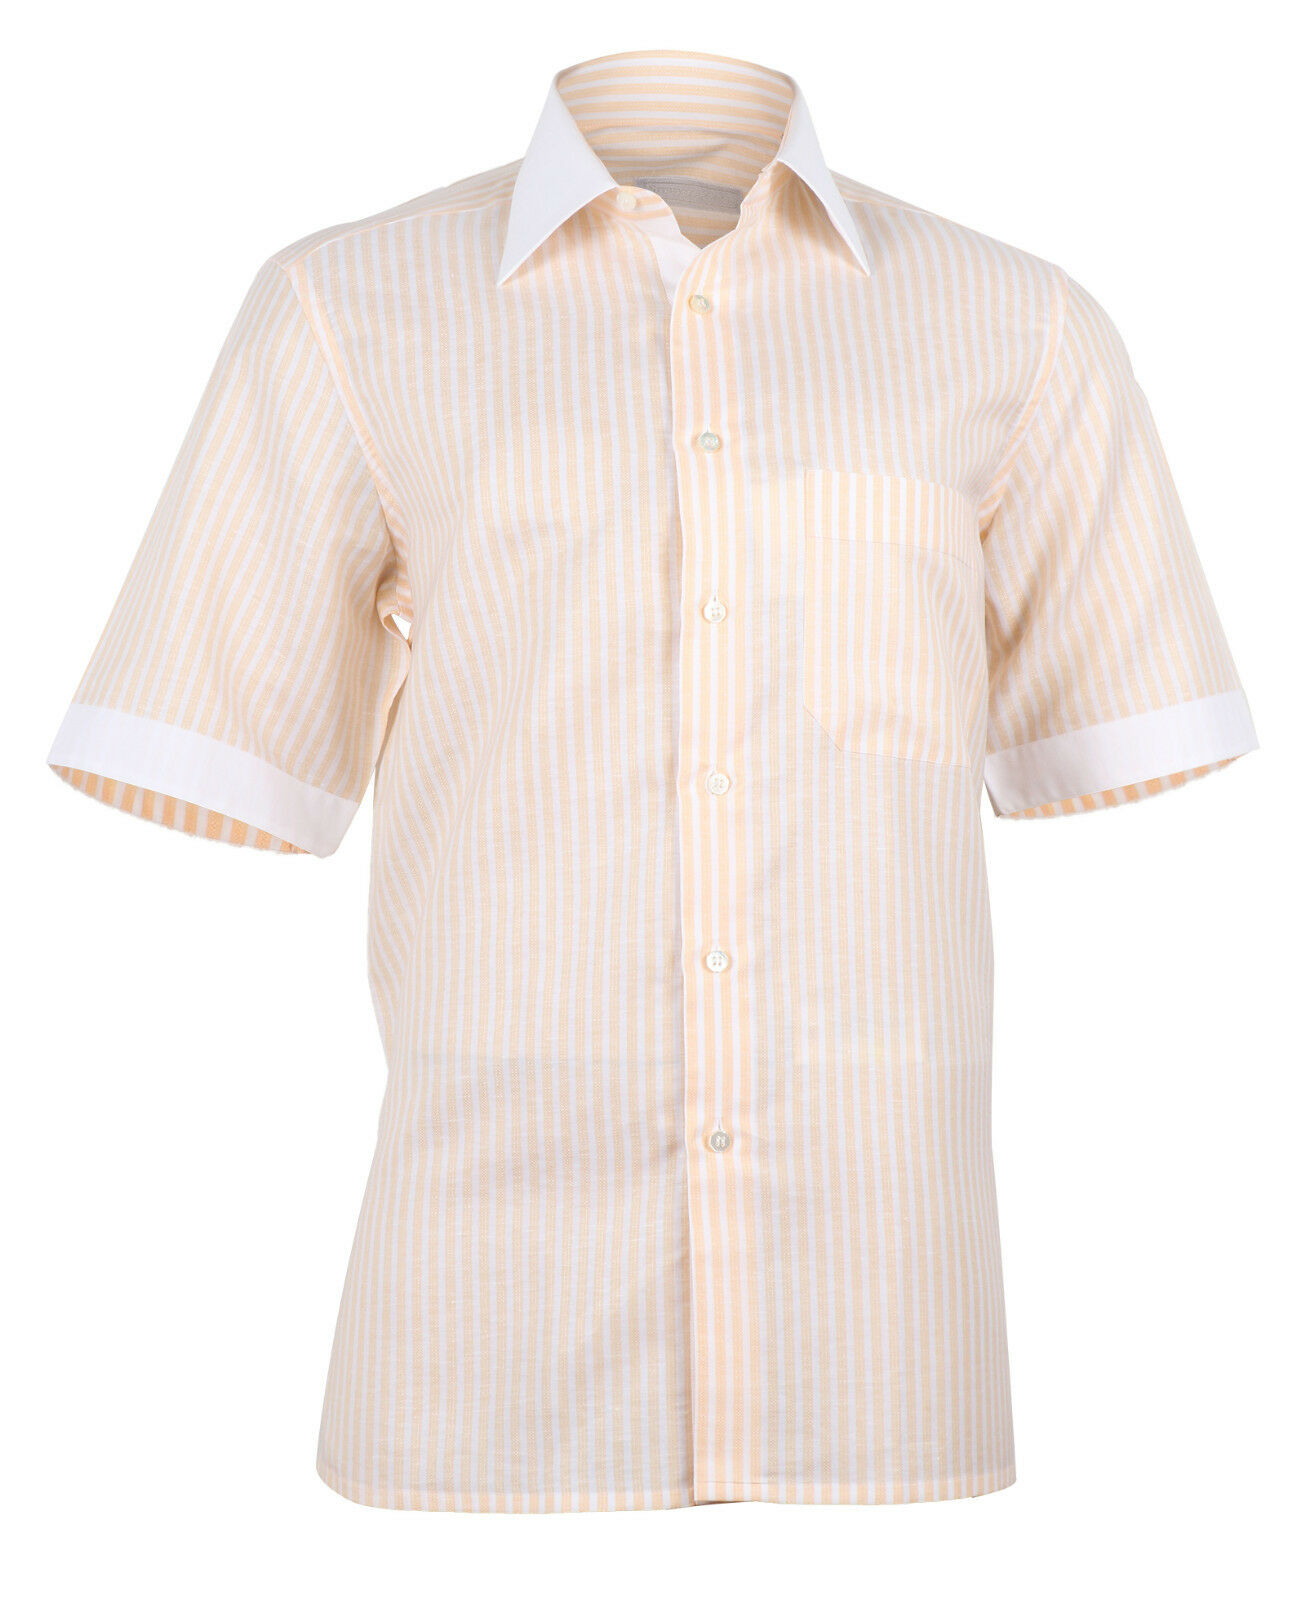 Stefano Ricci Men's Peach White Linen Cotton Couture Shirt Short Sleeve